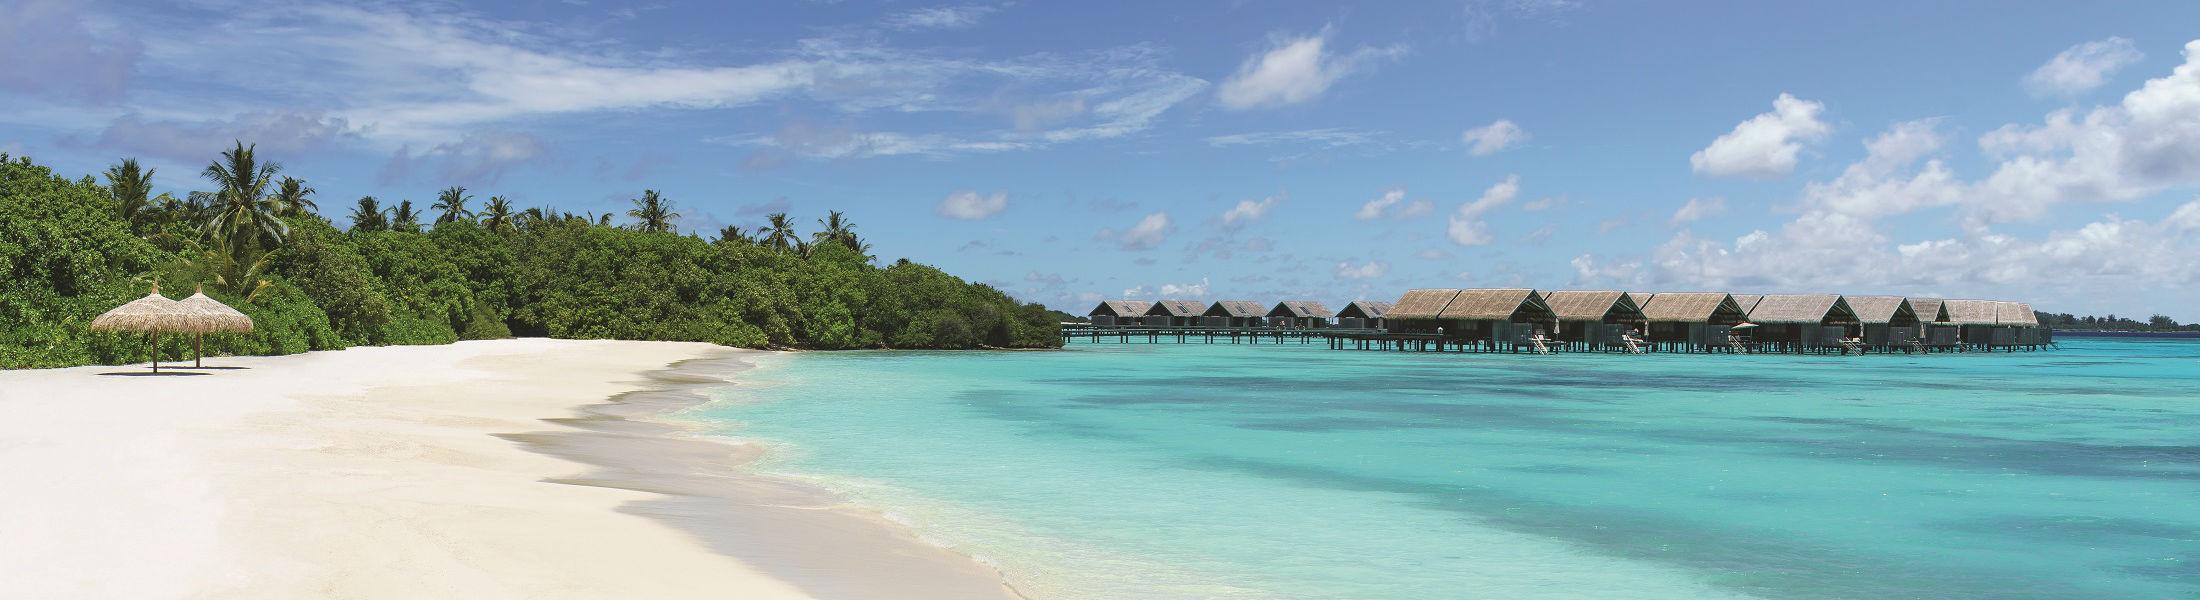 Serenity Bay Beach